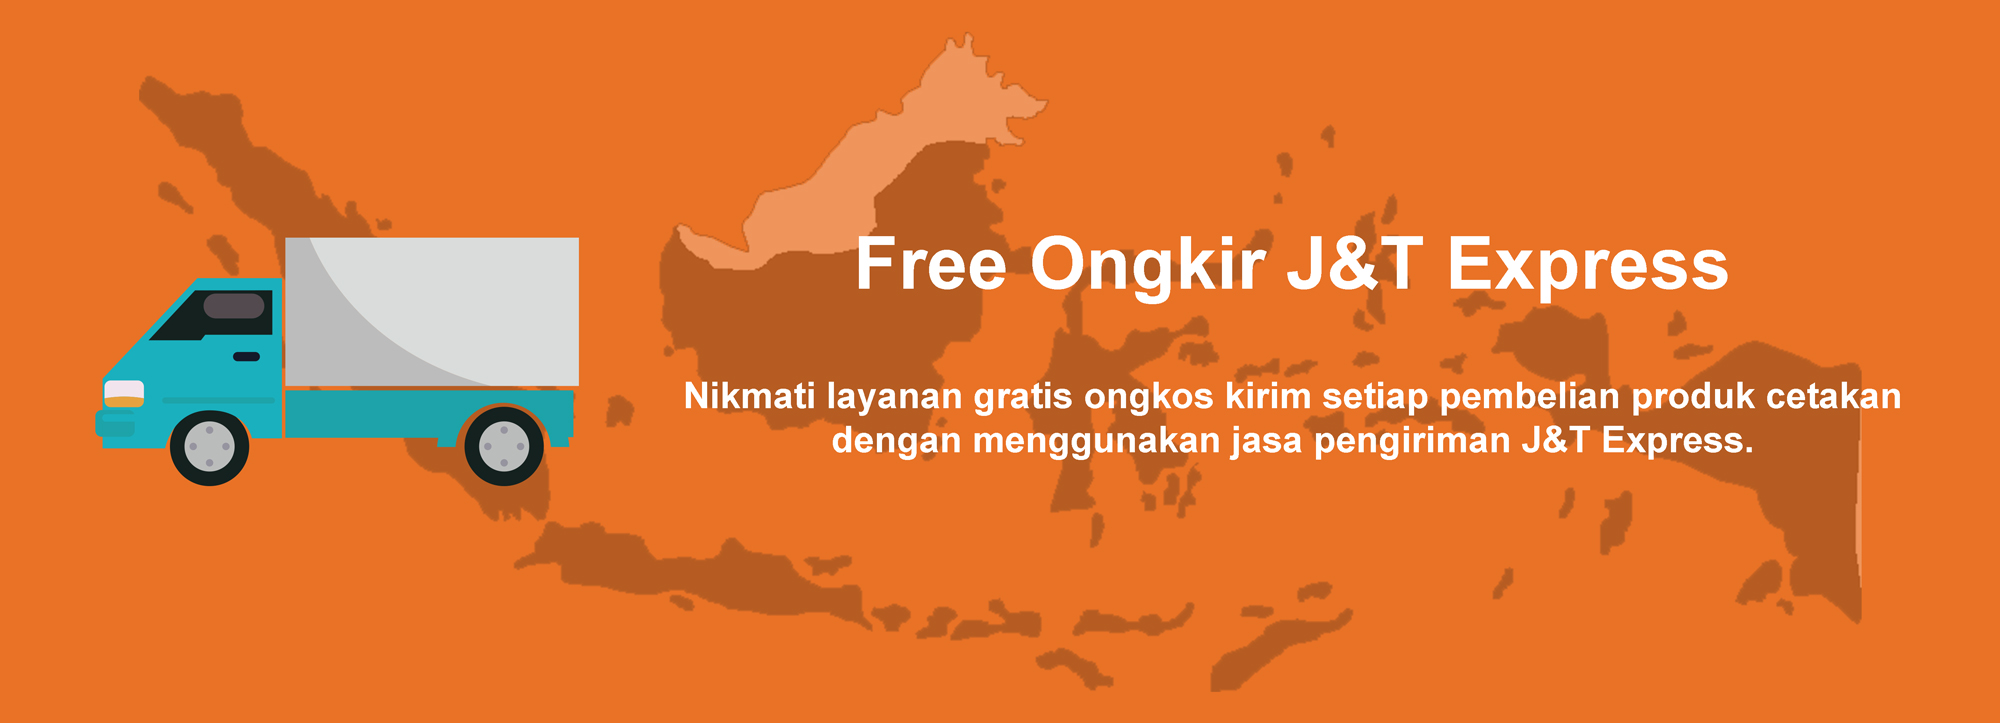 free-ongkir-keseluruh-indonesia